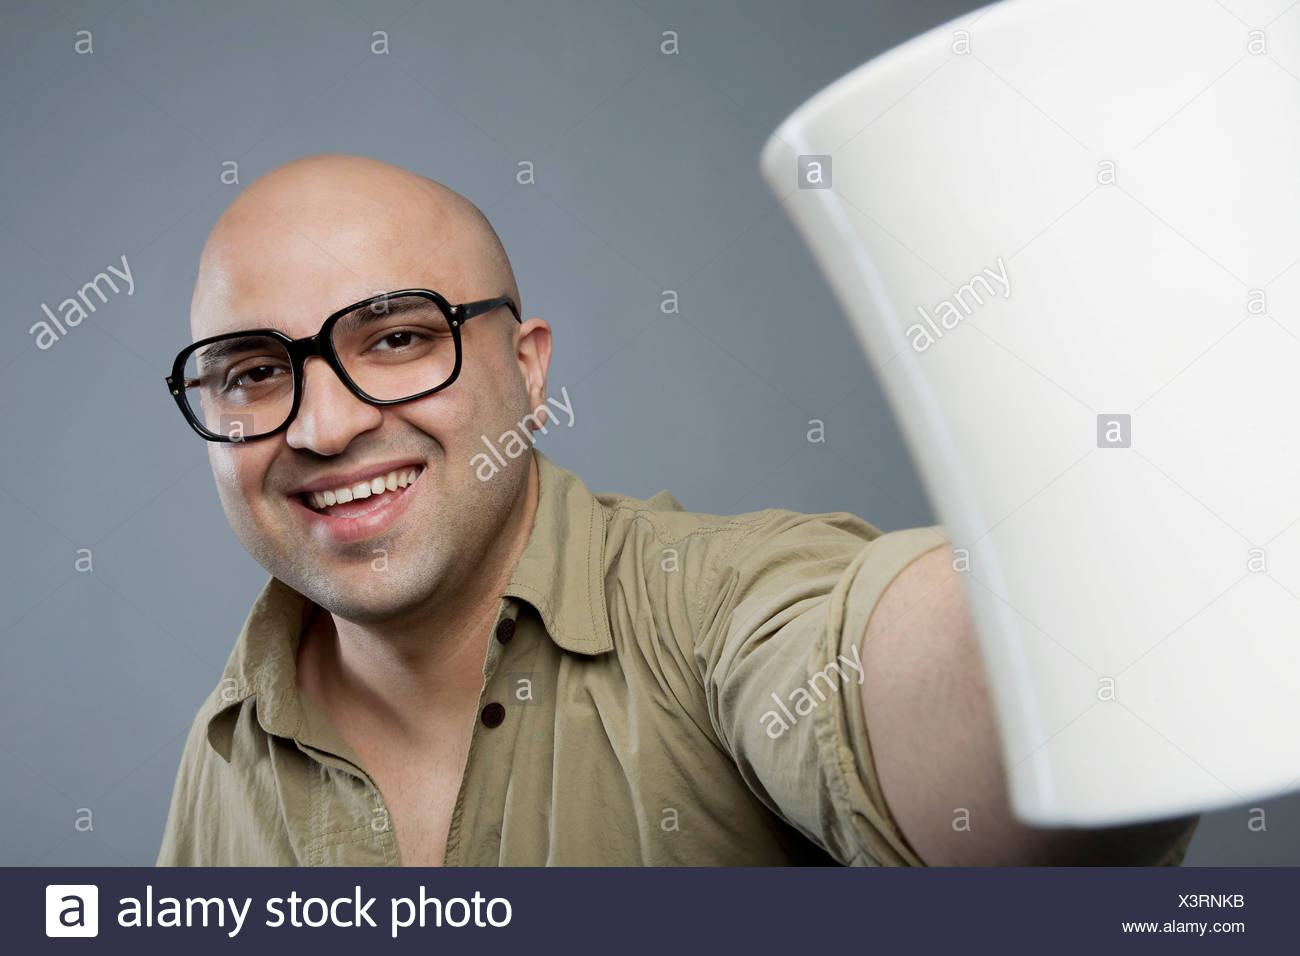 Bald man with a mug of tea - Stock Image